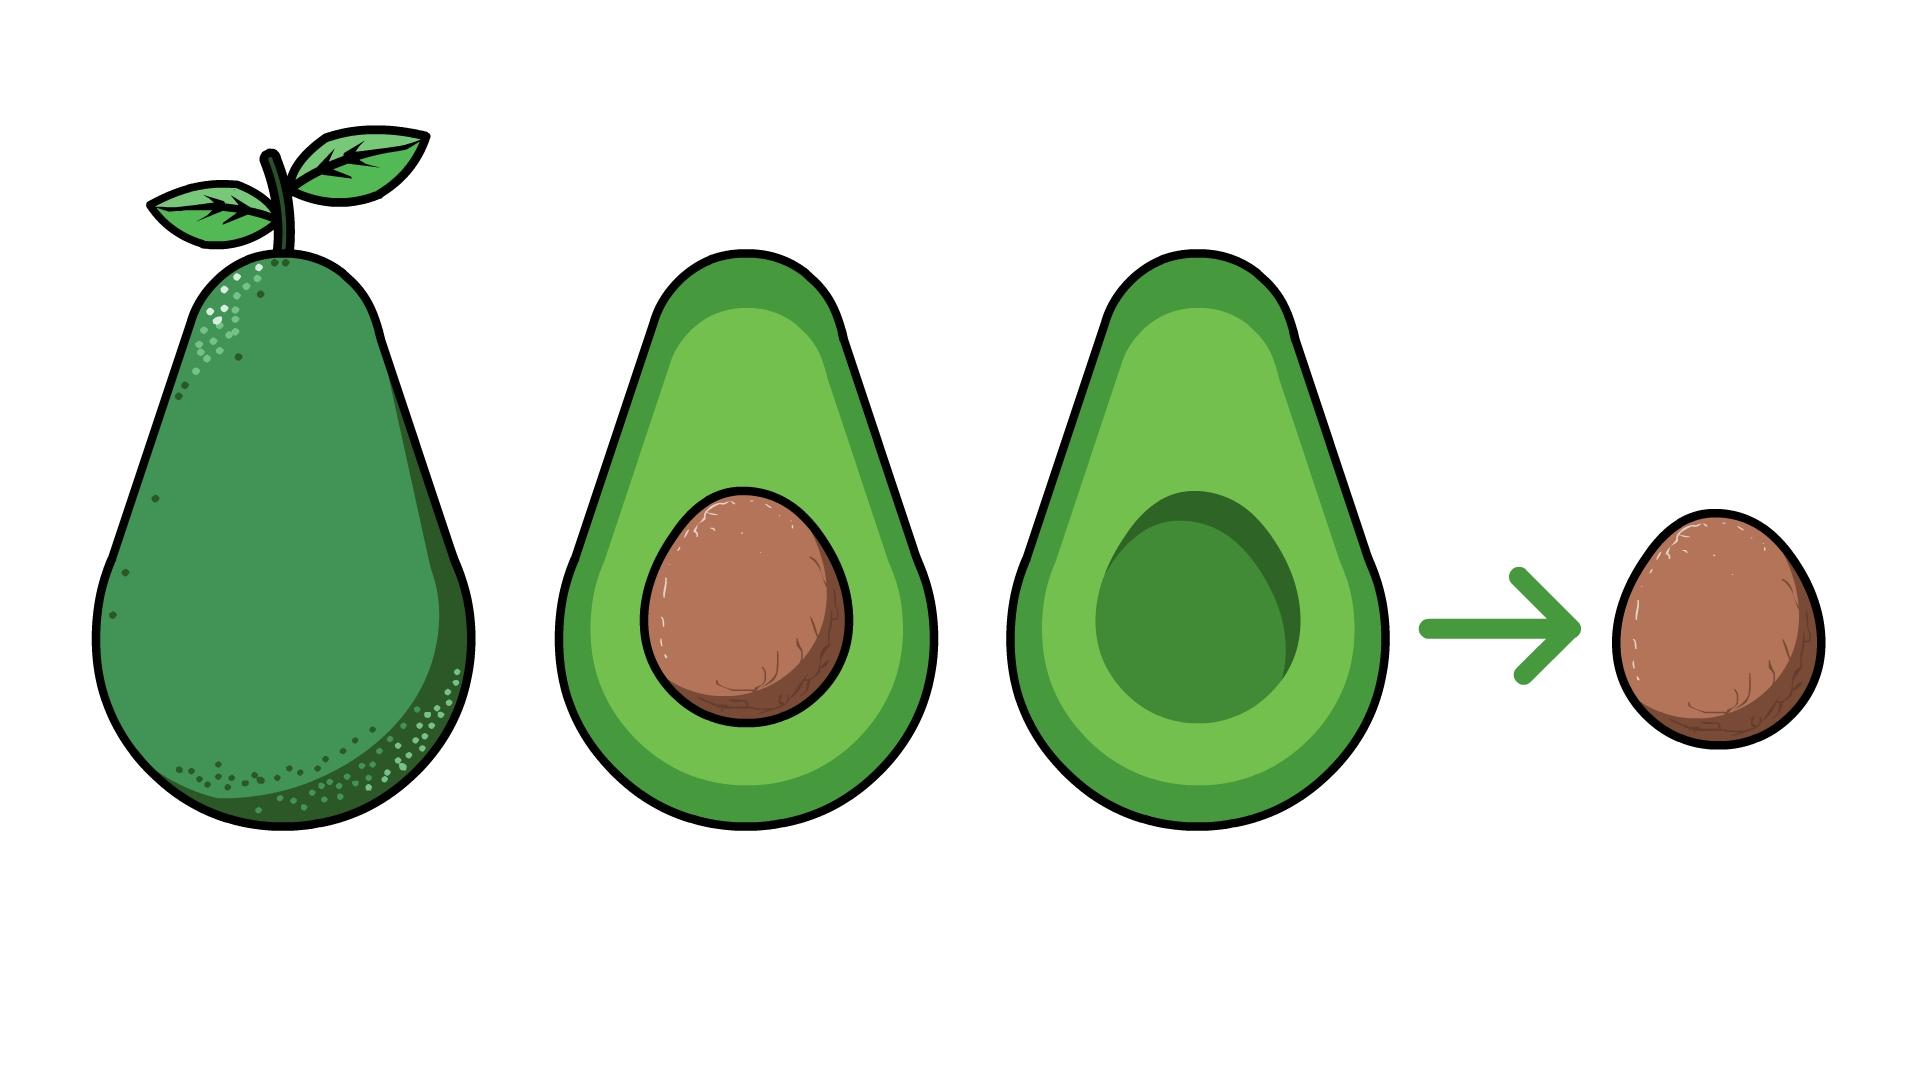 Fruit Tree Clipart Fruit Tree Isolated 25915852 Jpg   Tree drawing, Fruit  trees, Apple tree drawing